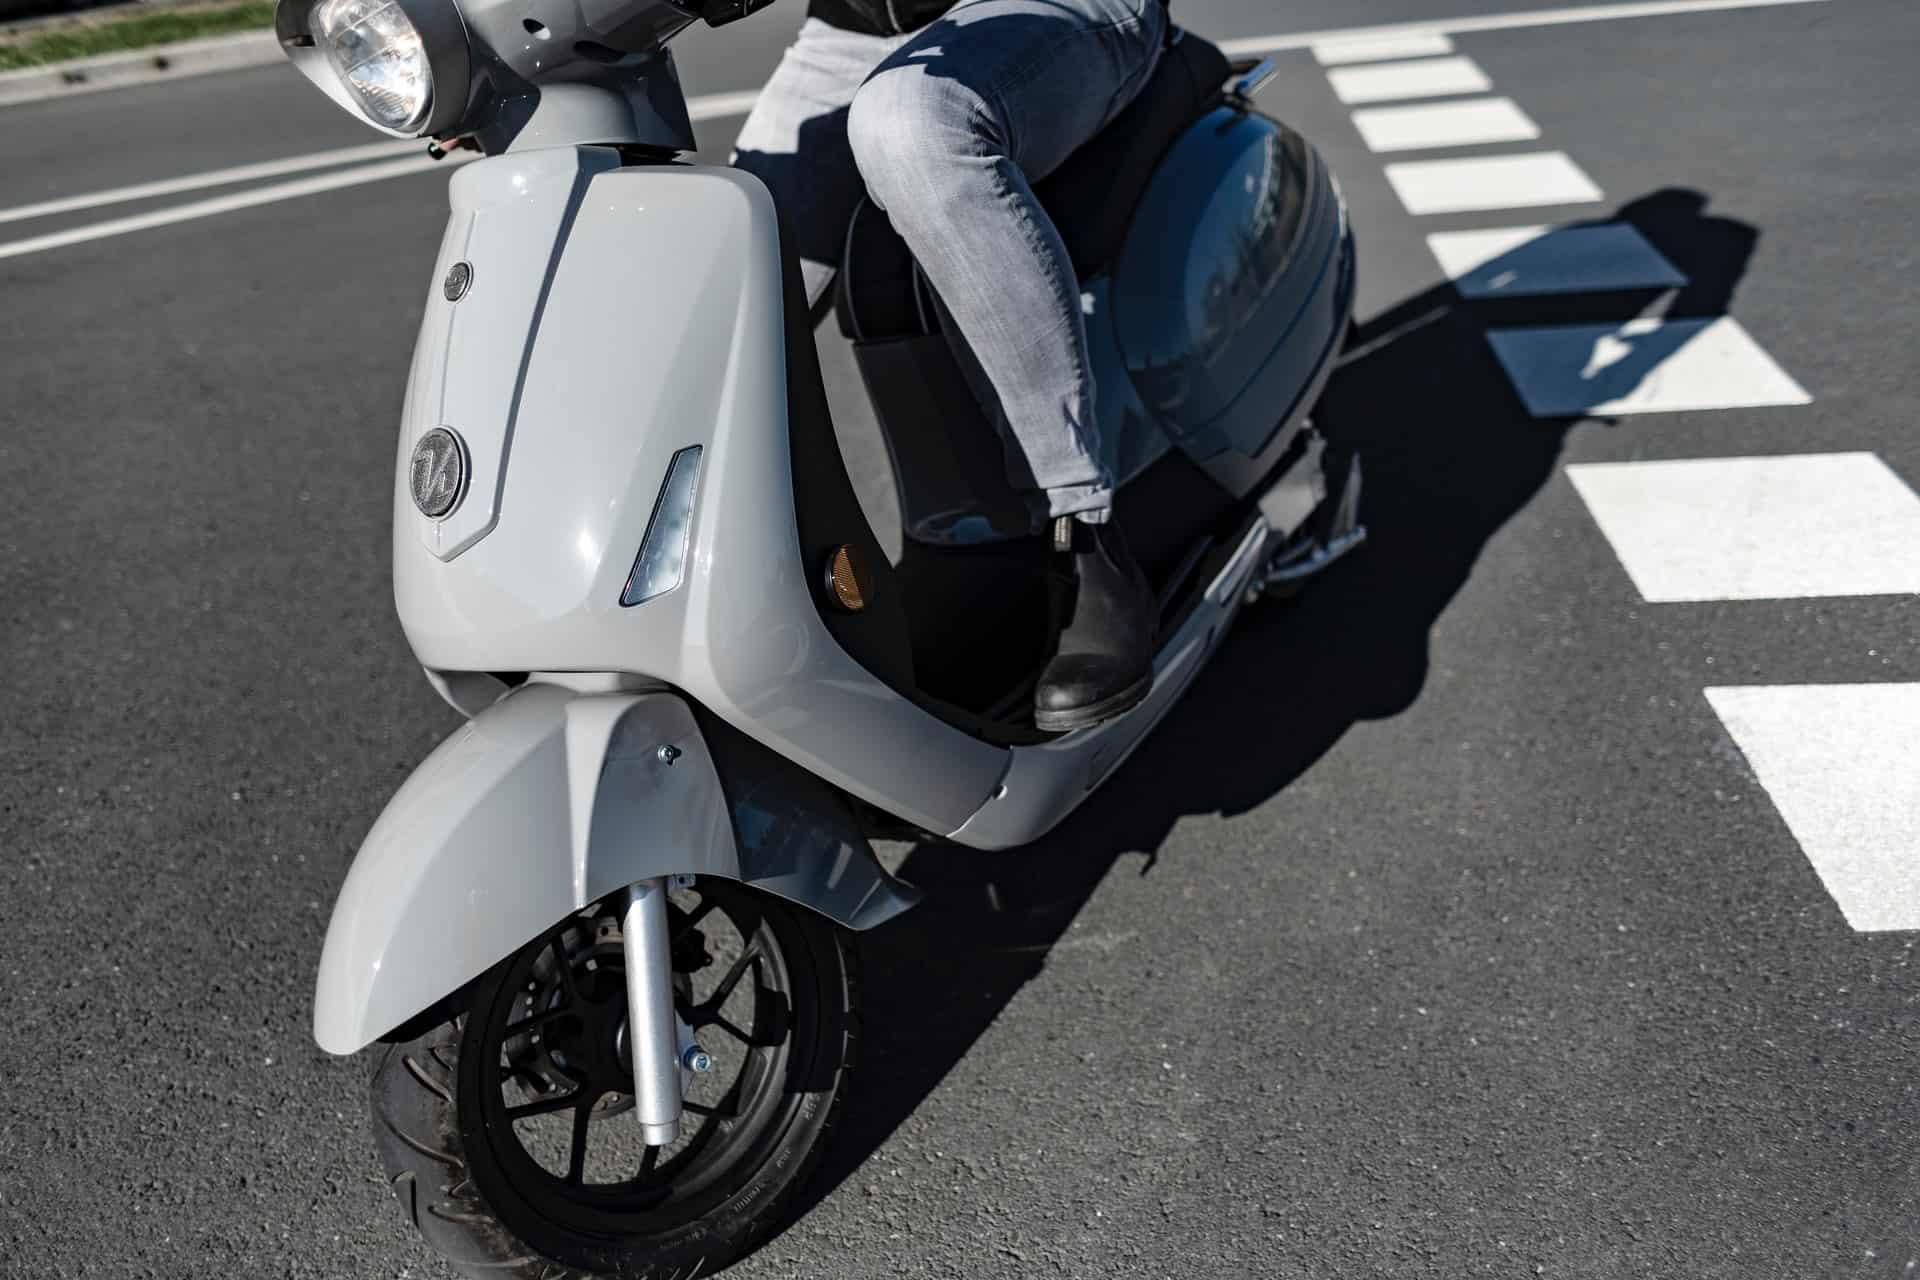 scooter bike turning